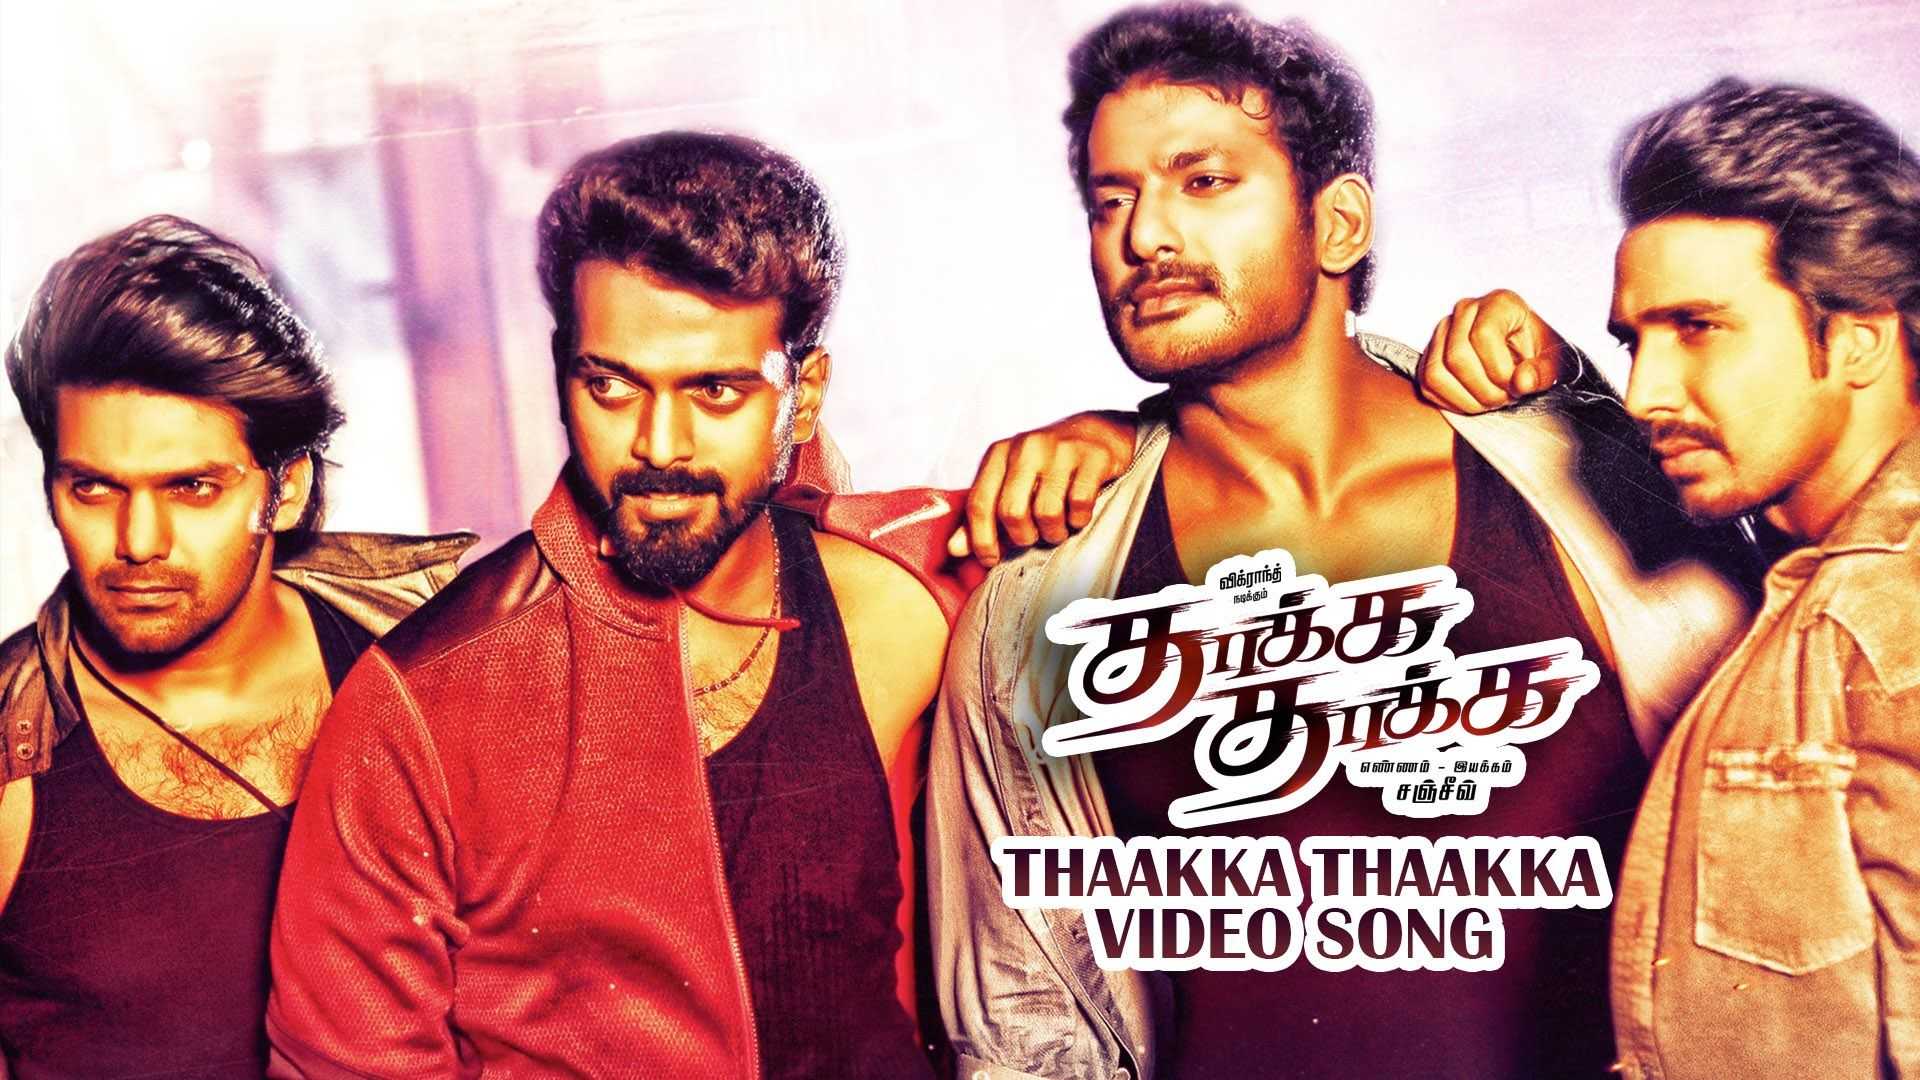 free tamil mp3 download songs tamil movi download